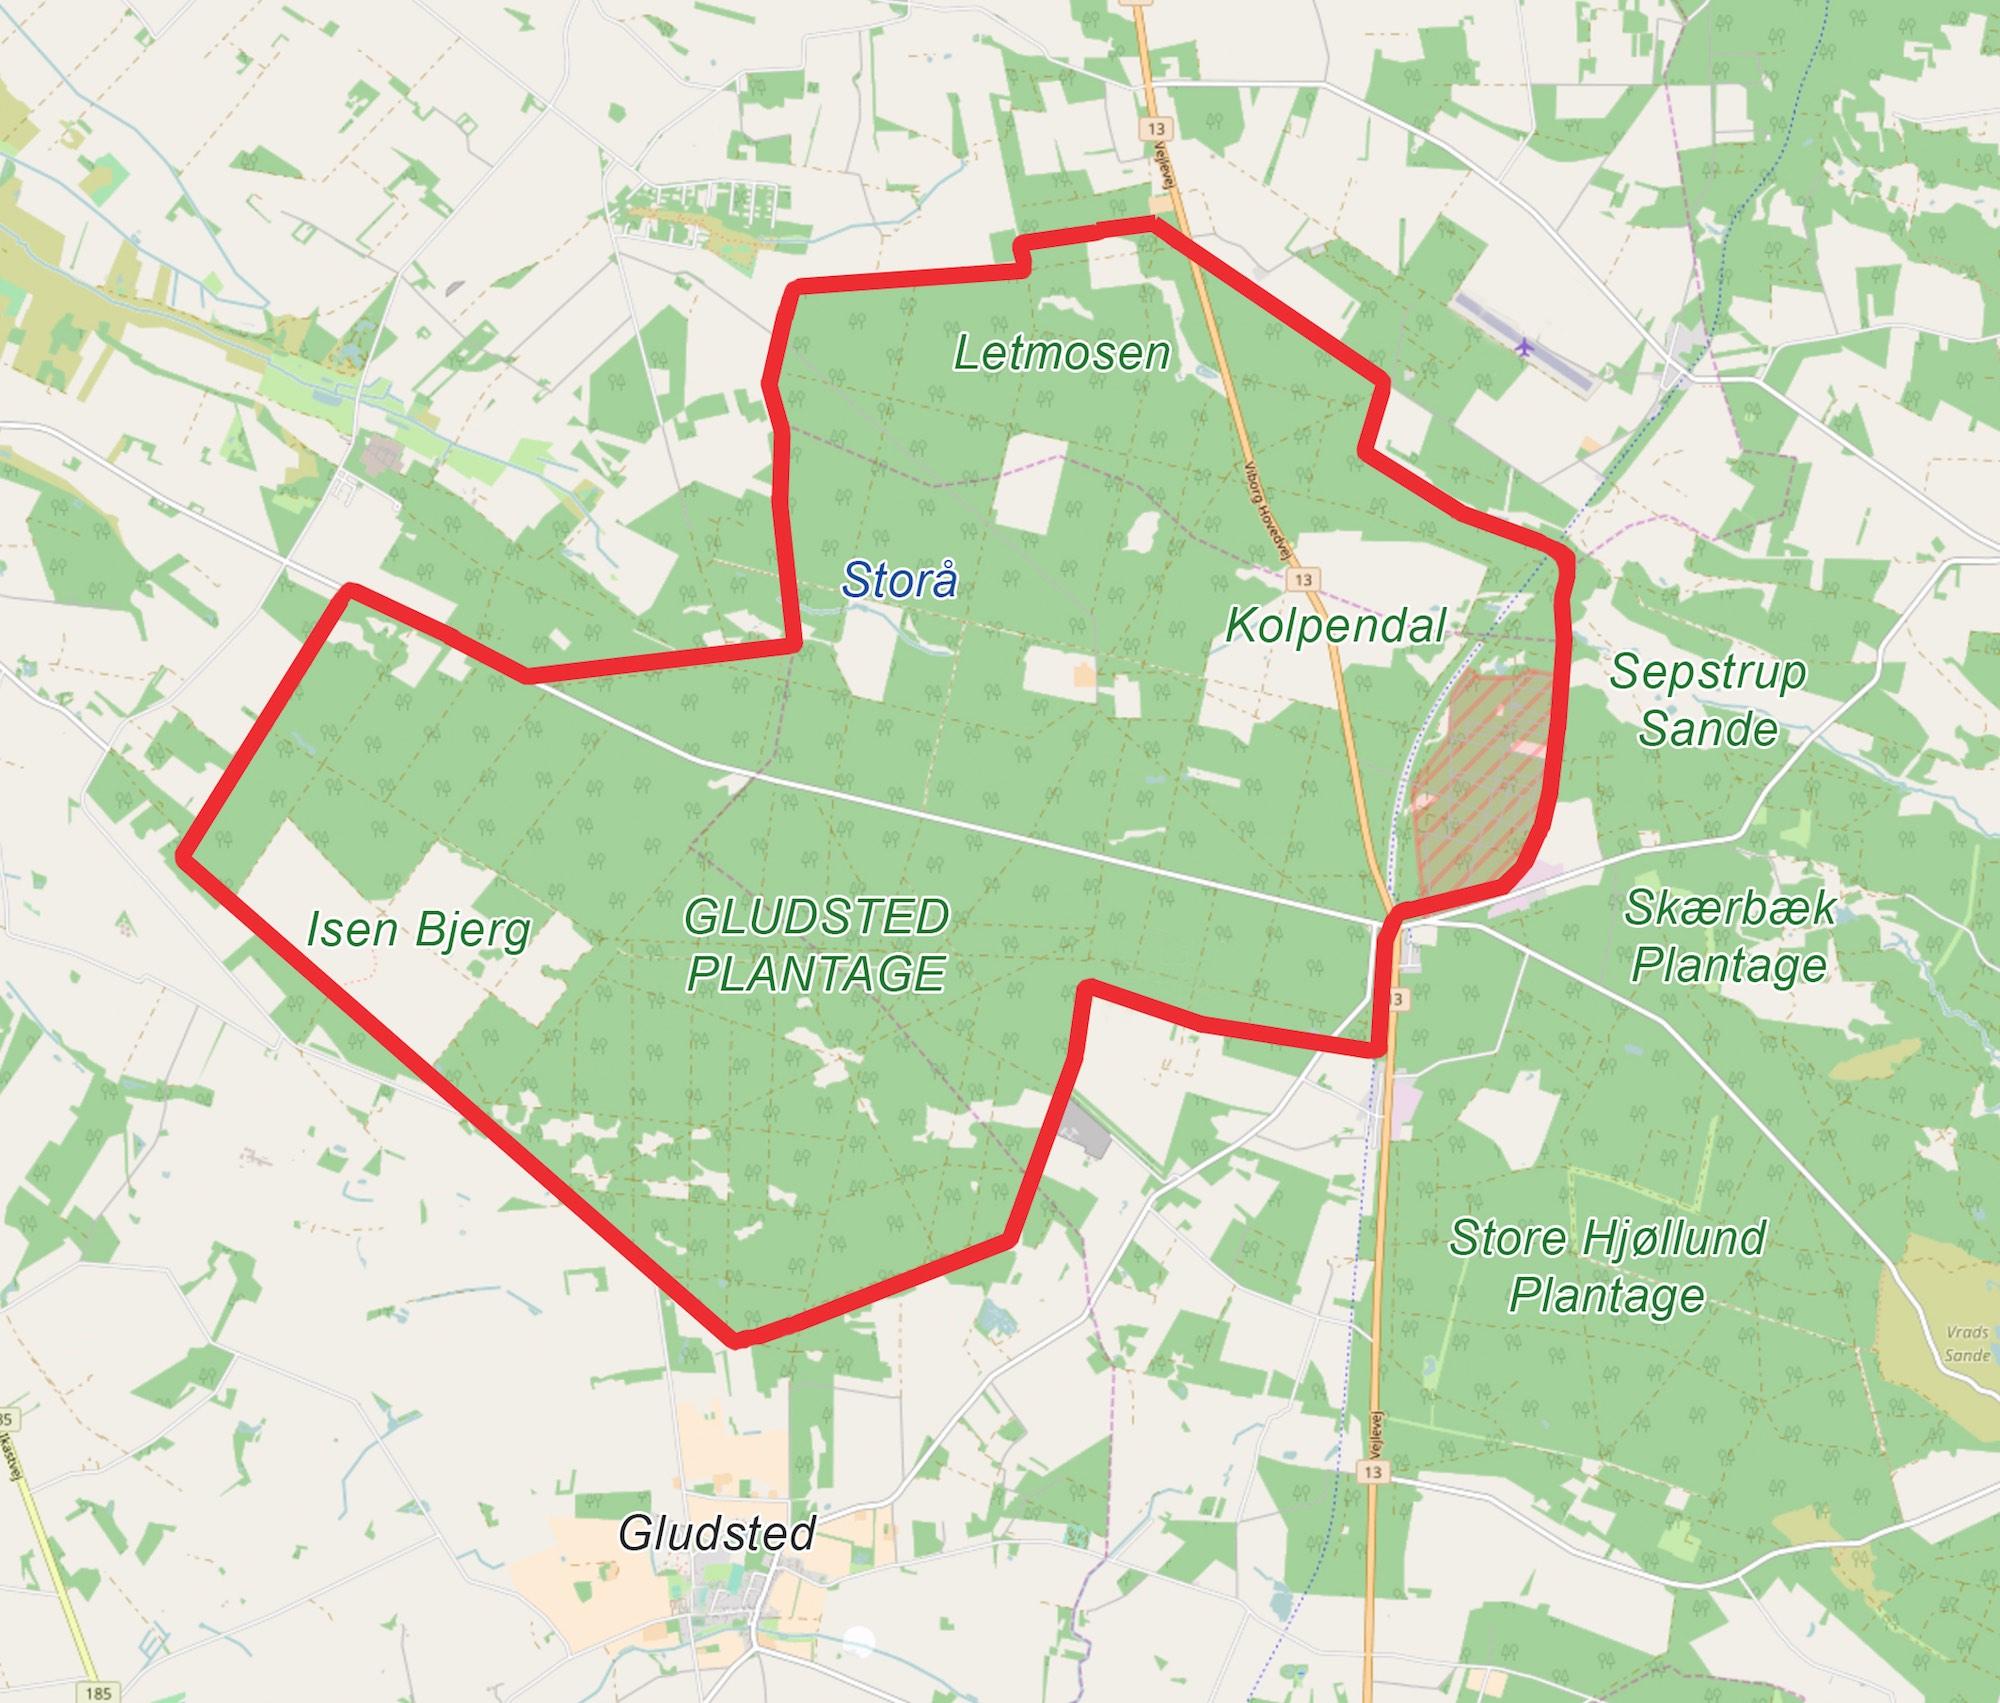 Naturnationalpark Gludsted Skov & Isen Bjerg kunne blive et 3.400 hektar stort naturreservat, hvilke prioriteringen og viljen er til stede (kortet er baseret på OpenStreetMap).